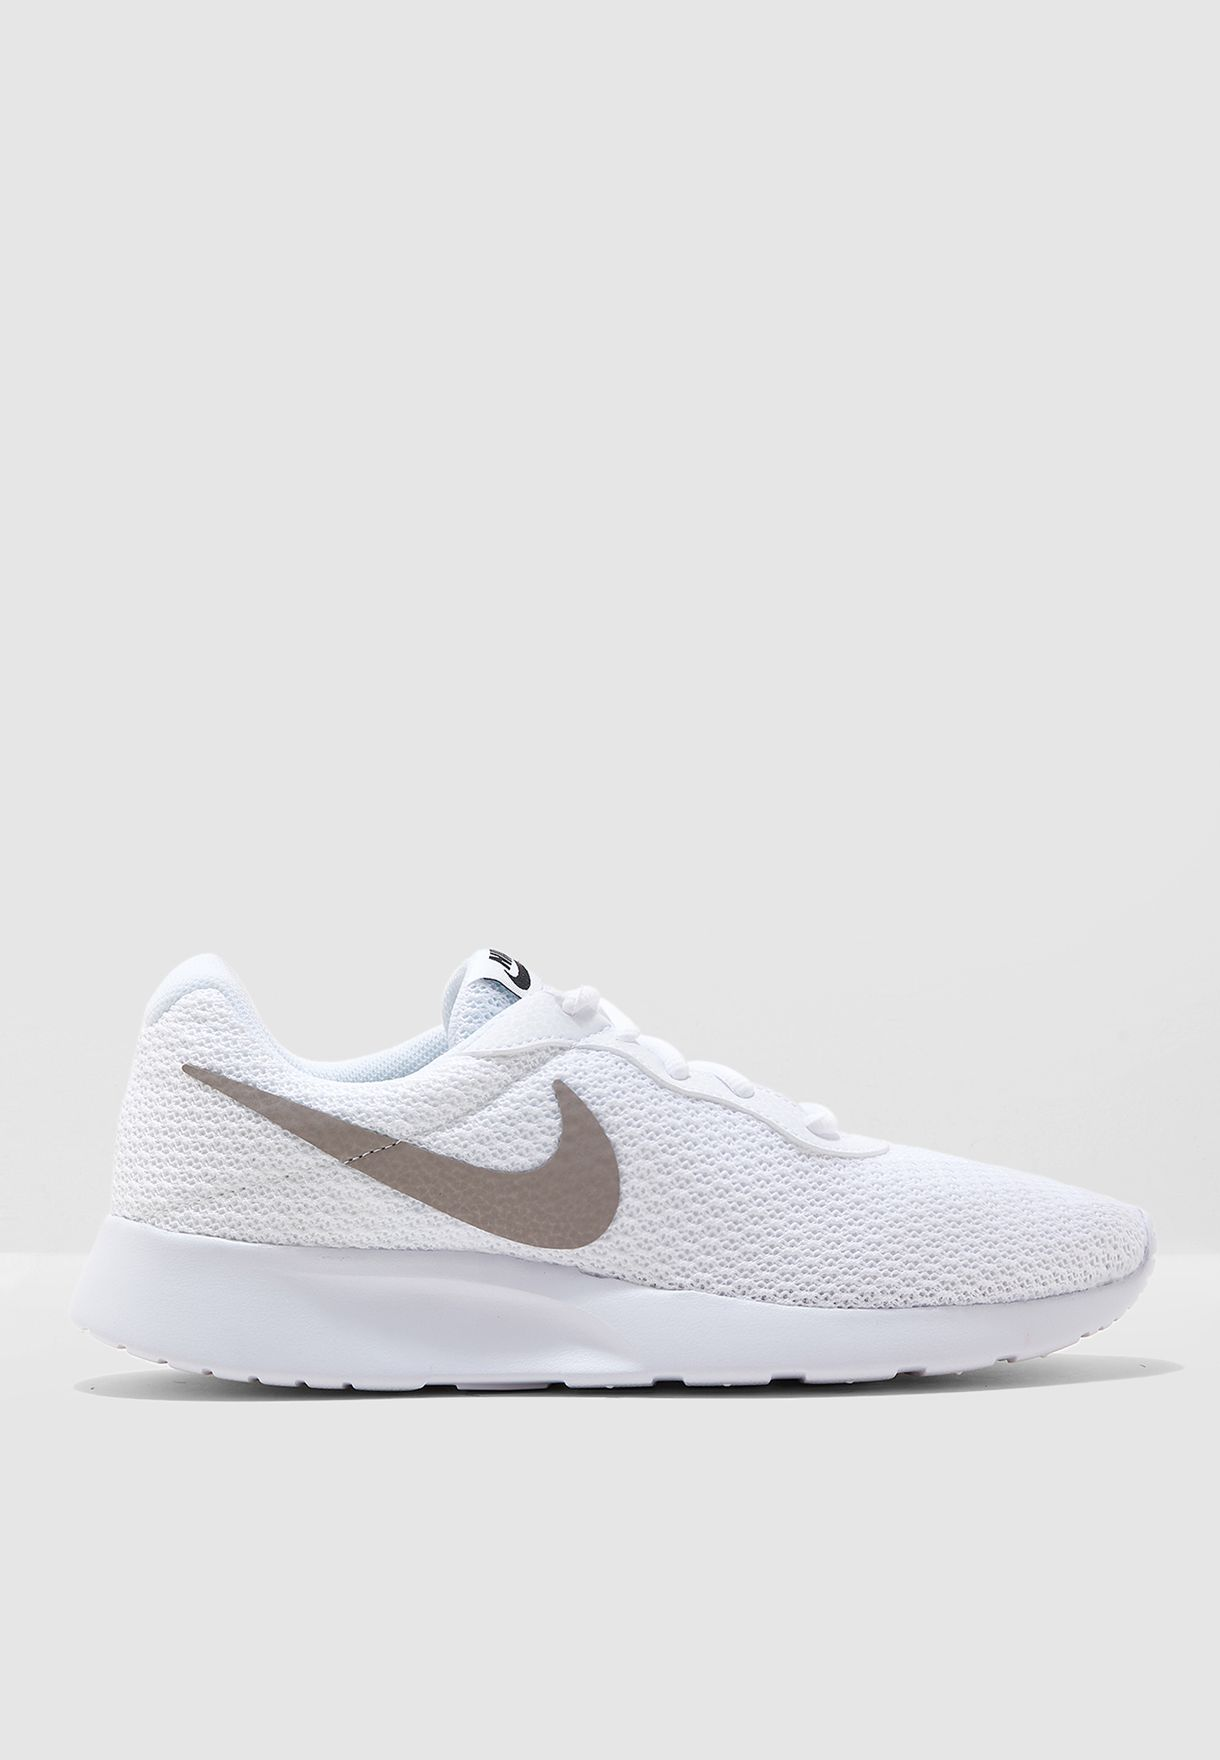 best website 9dbb7 4c065 Shop Nike white Tanjun 812654-104 for Men in UAE - 72704SH08DCP